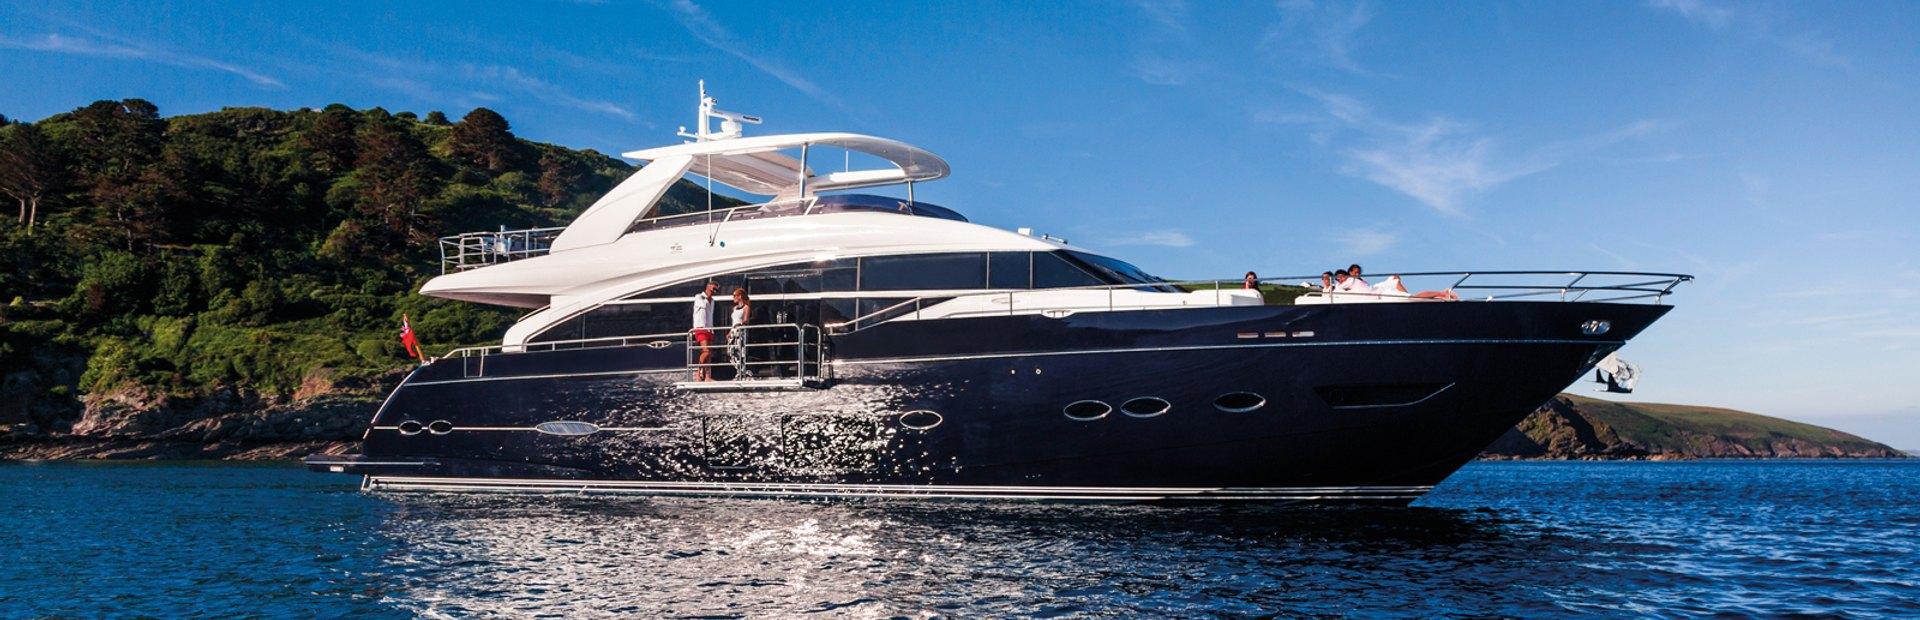 Princess Y88 Yacht Charter